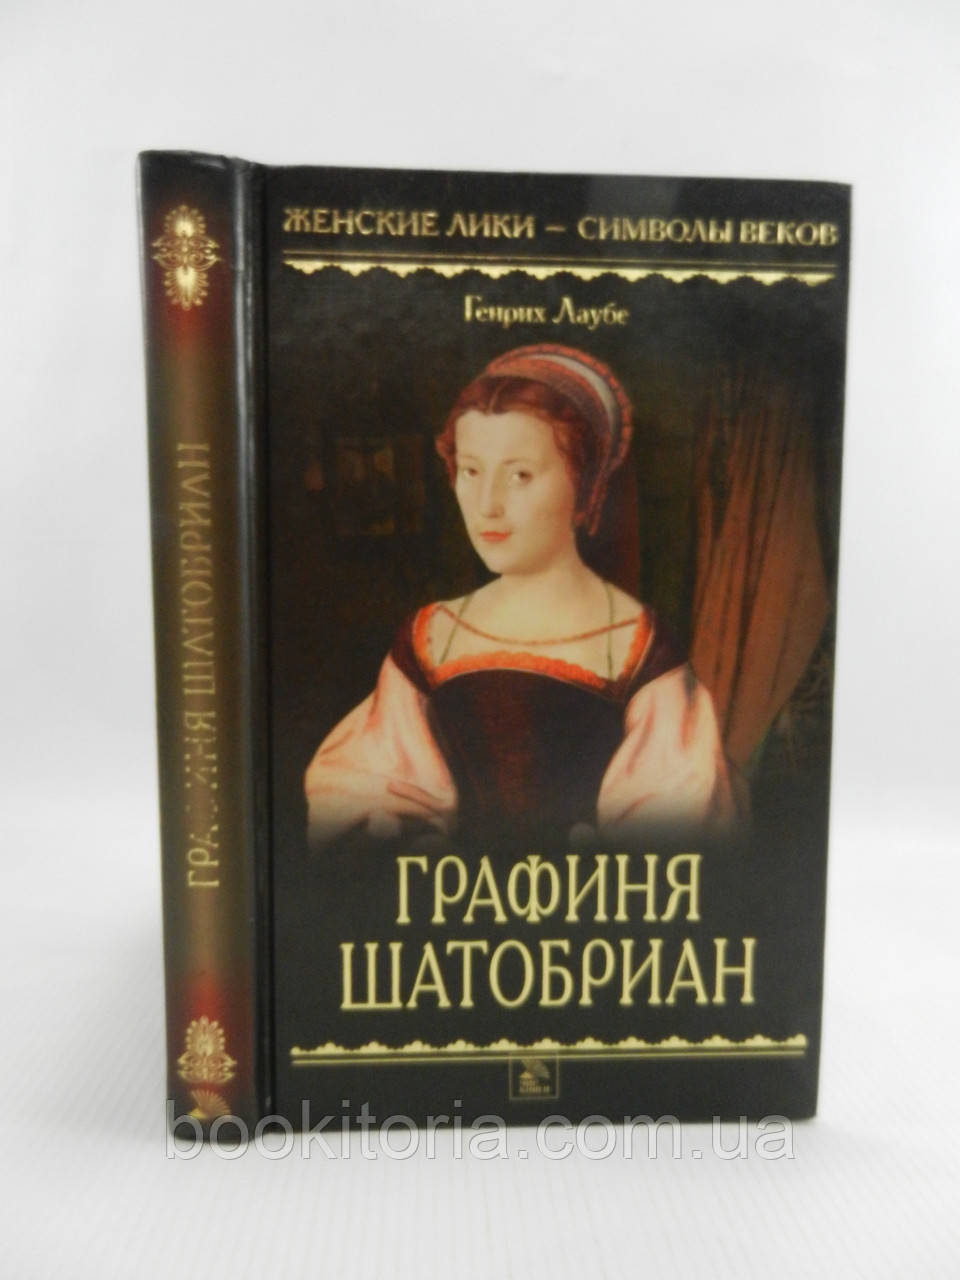 Лаубе Г. Графиня Шатобриан (б/у).